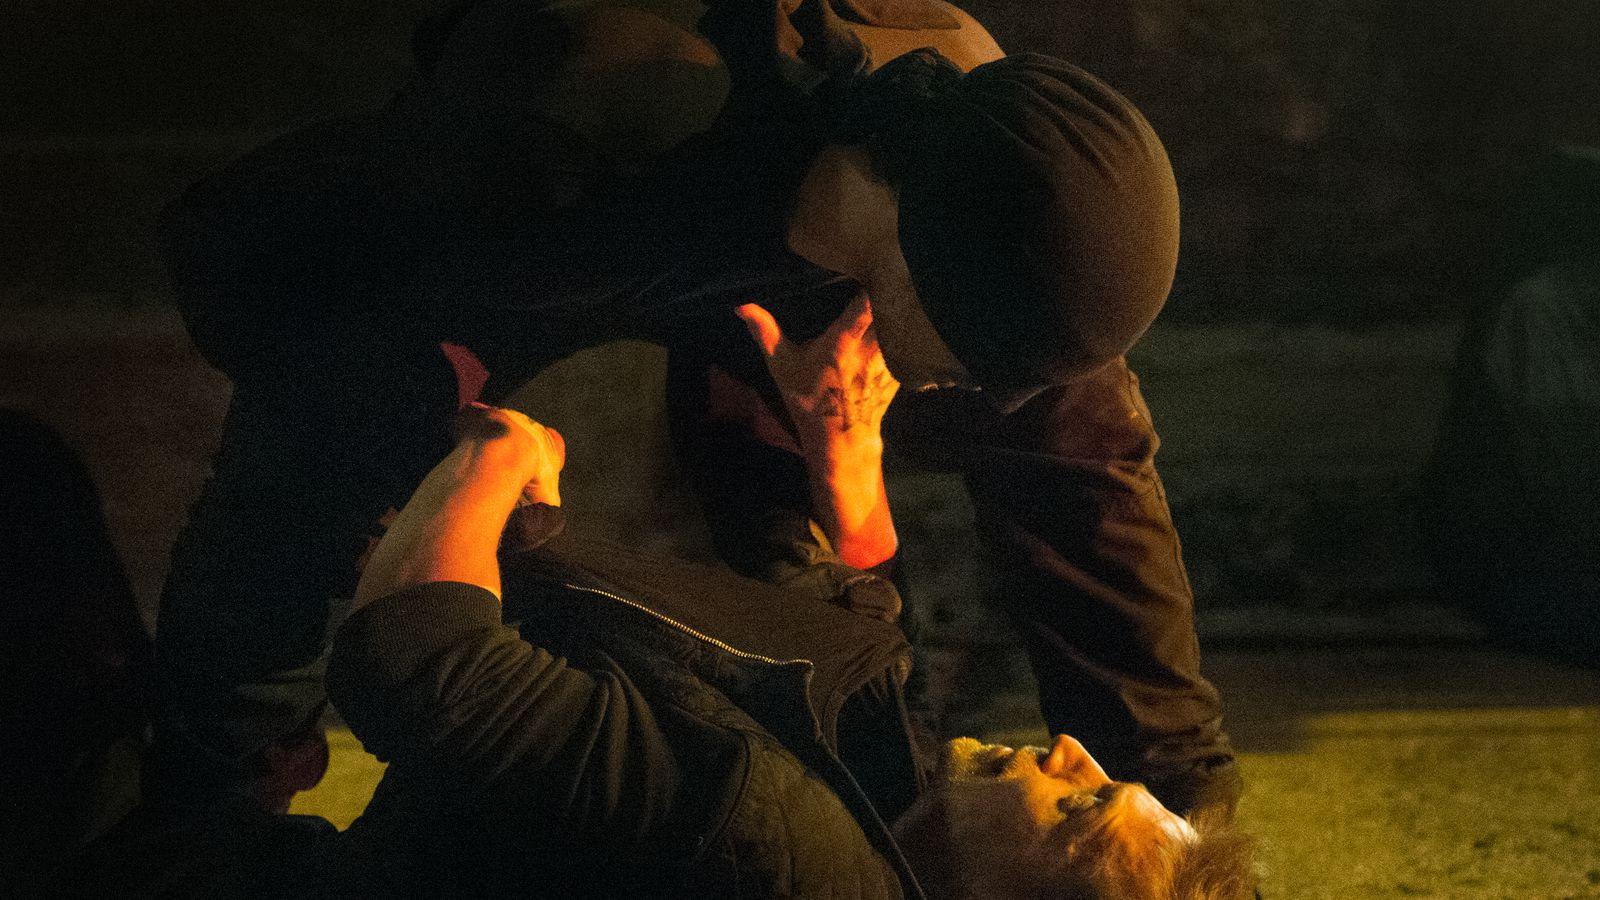 Watch Matt Murdock kick ass in this new Daredevil trailer ...